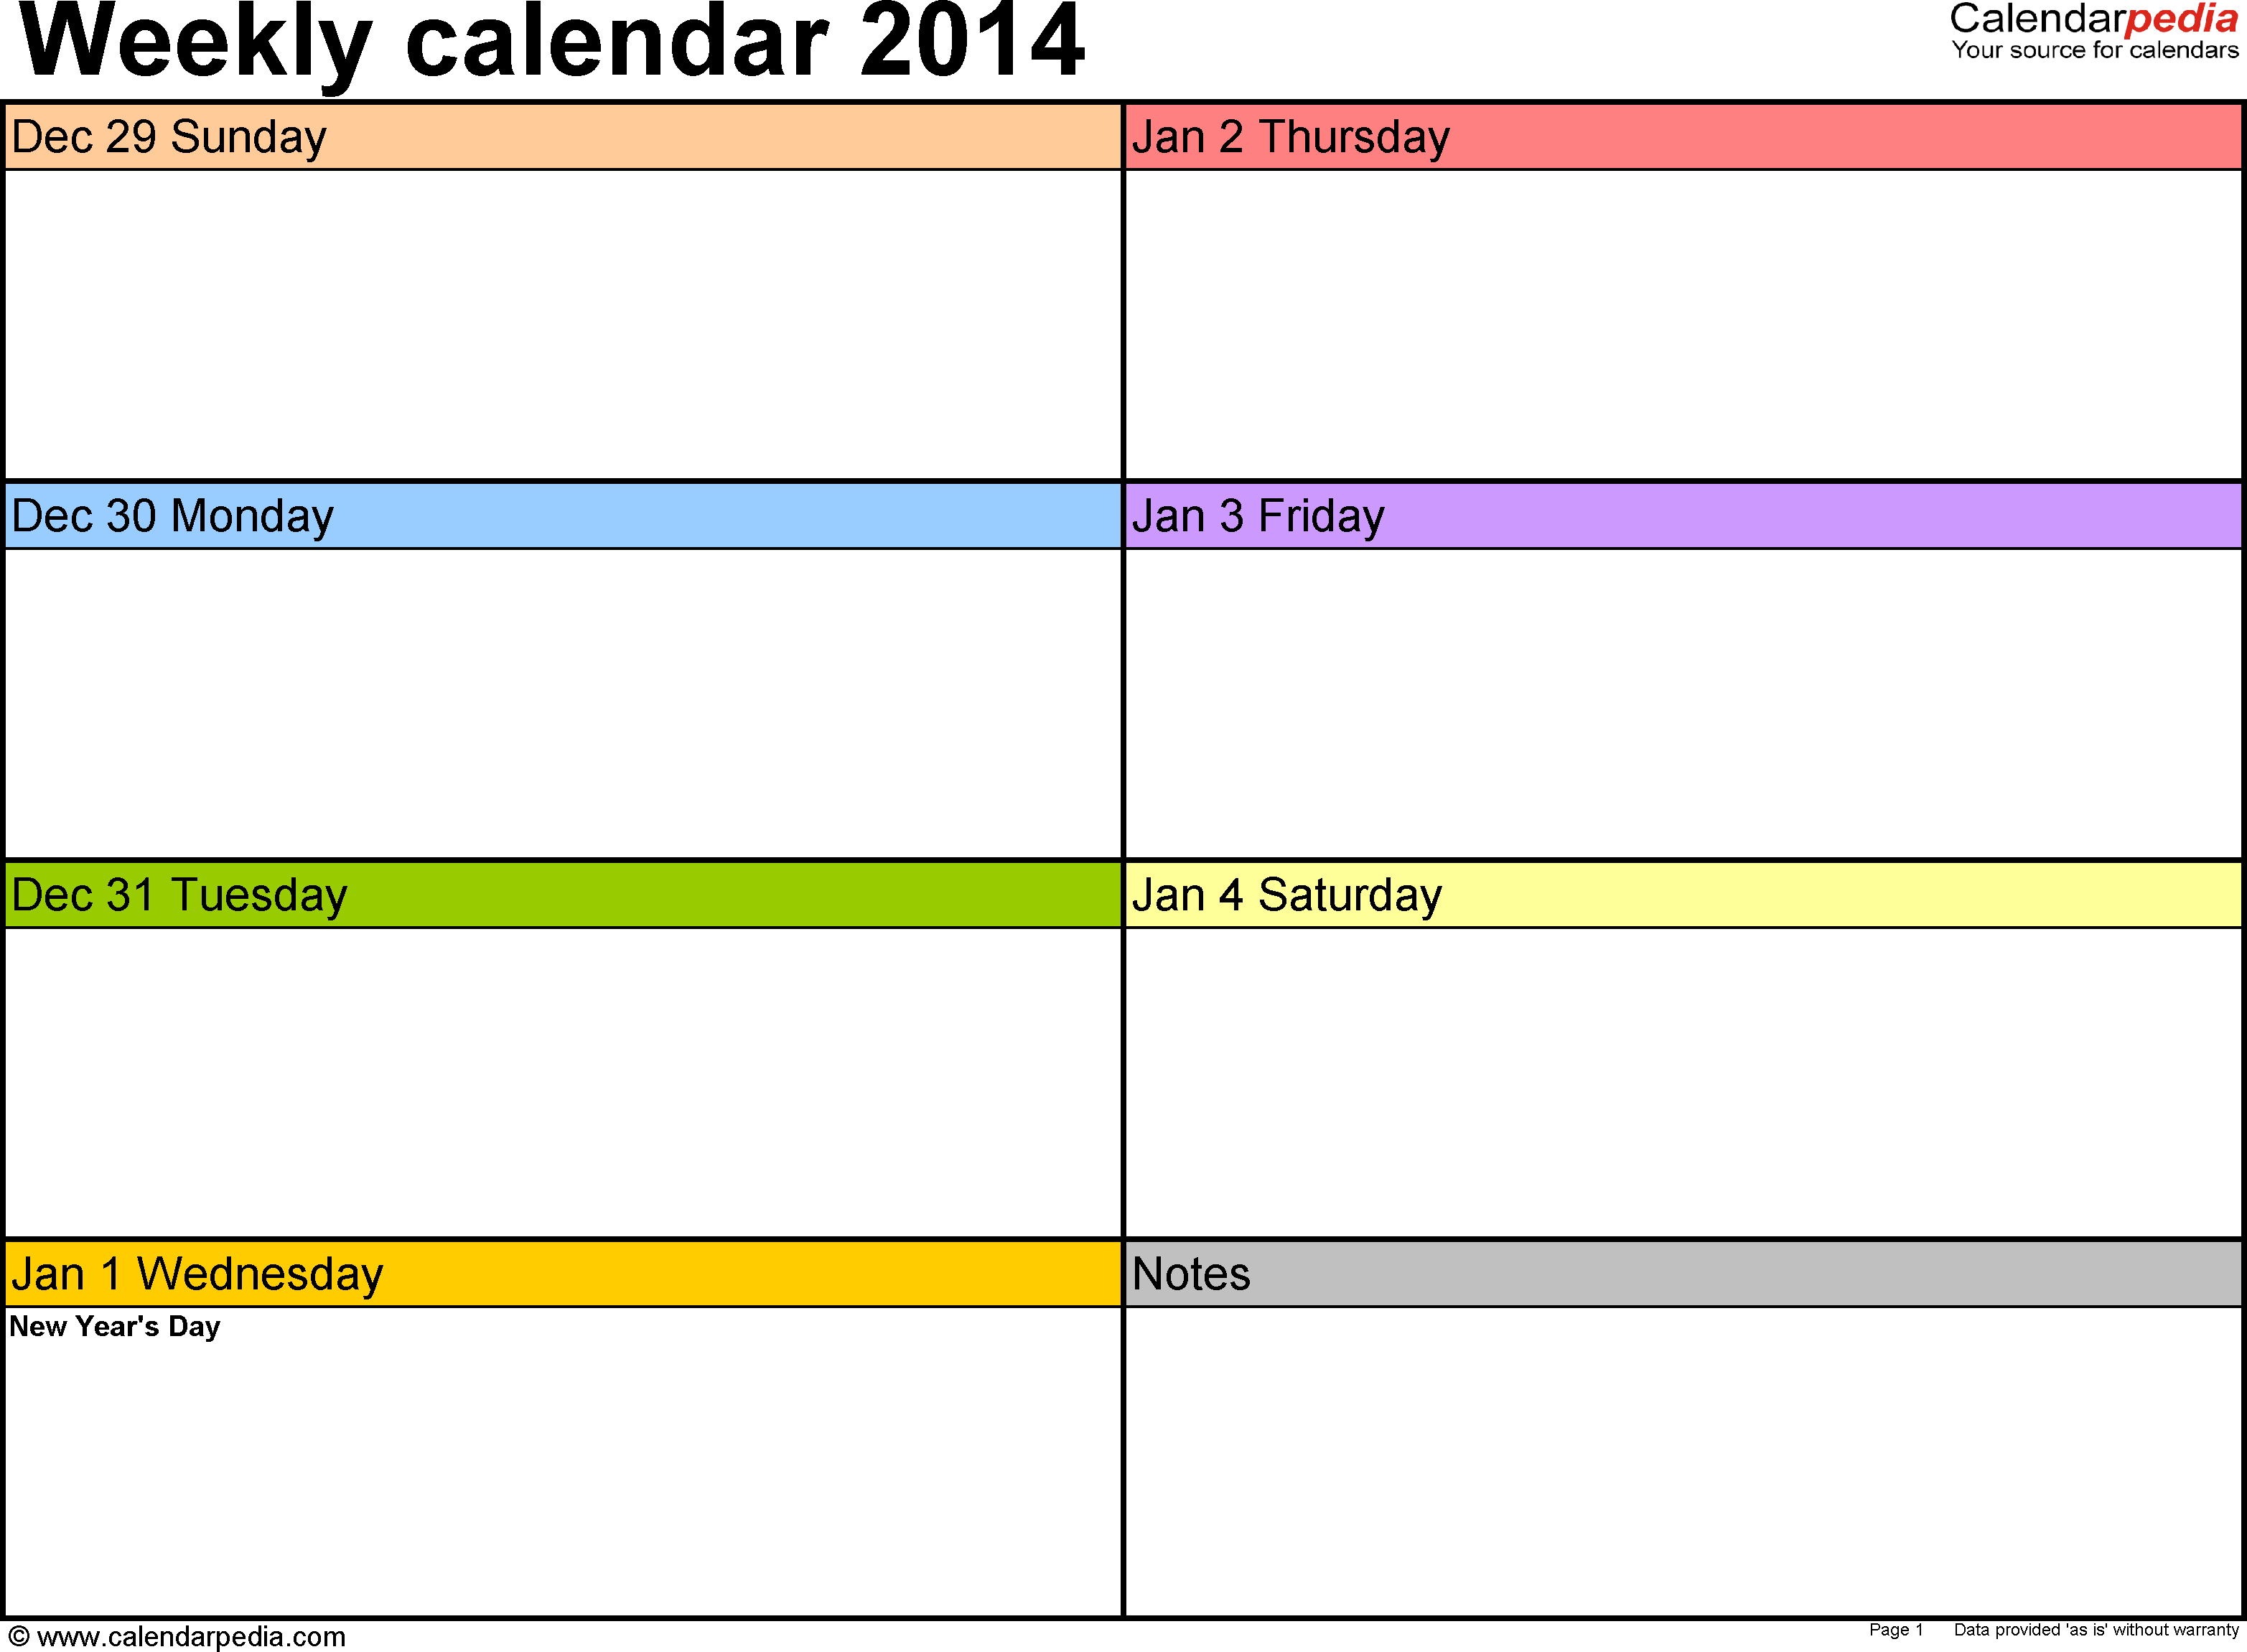 Weekly Calendar 2014 For Word - 4 Free Printable Templates intended for Printable Blank Calendar Week